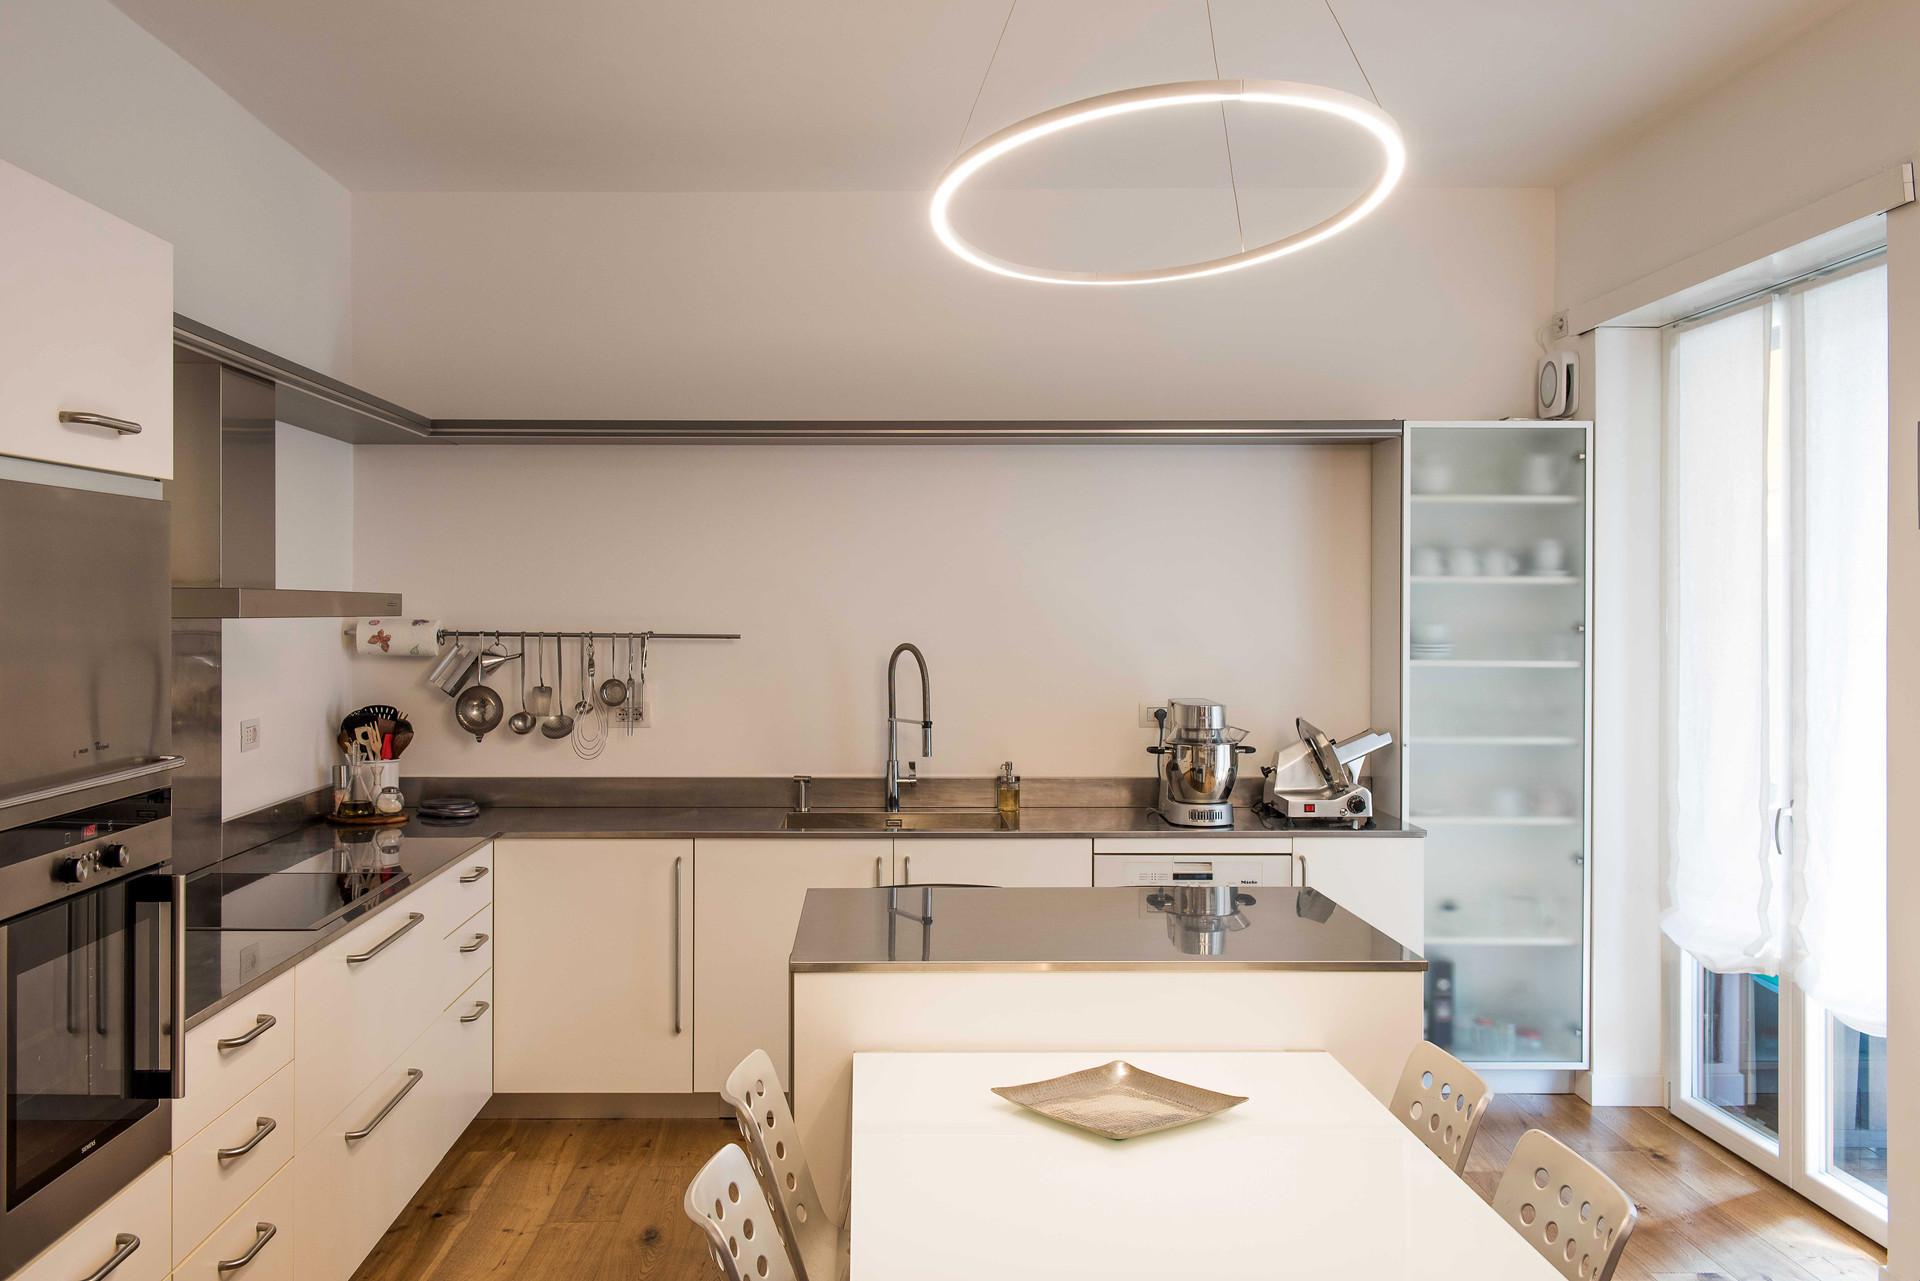 cucina - zona pranzo I kitchen - dining room